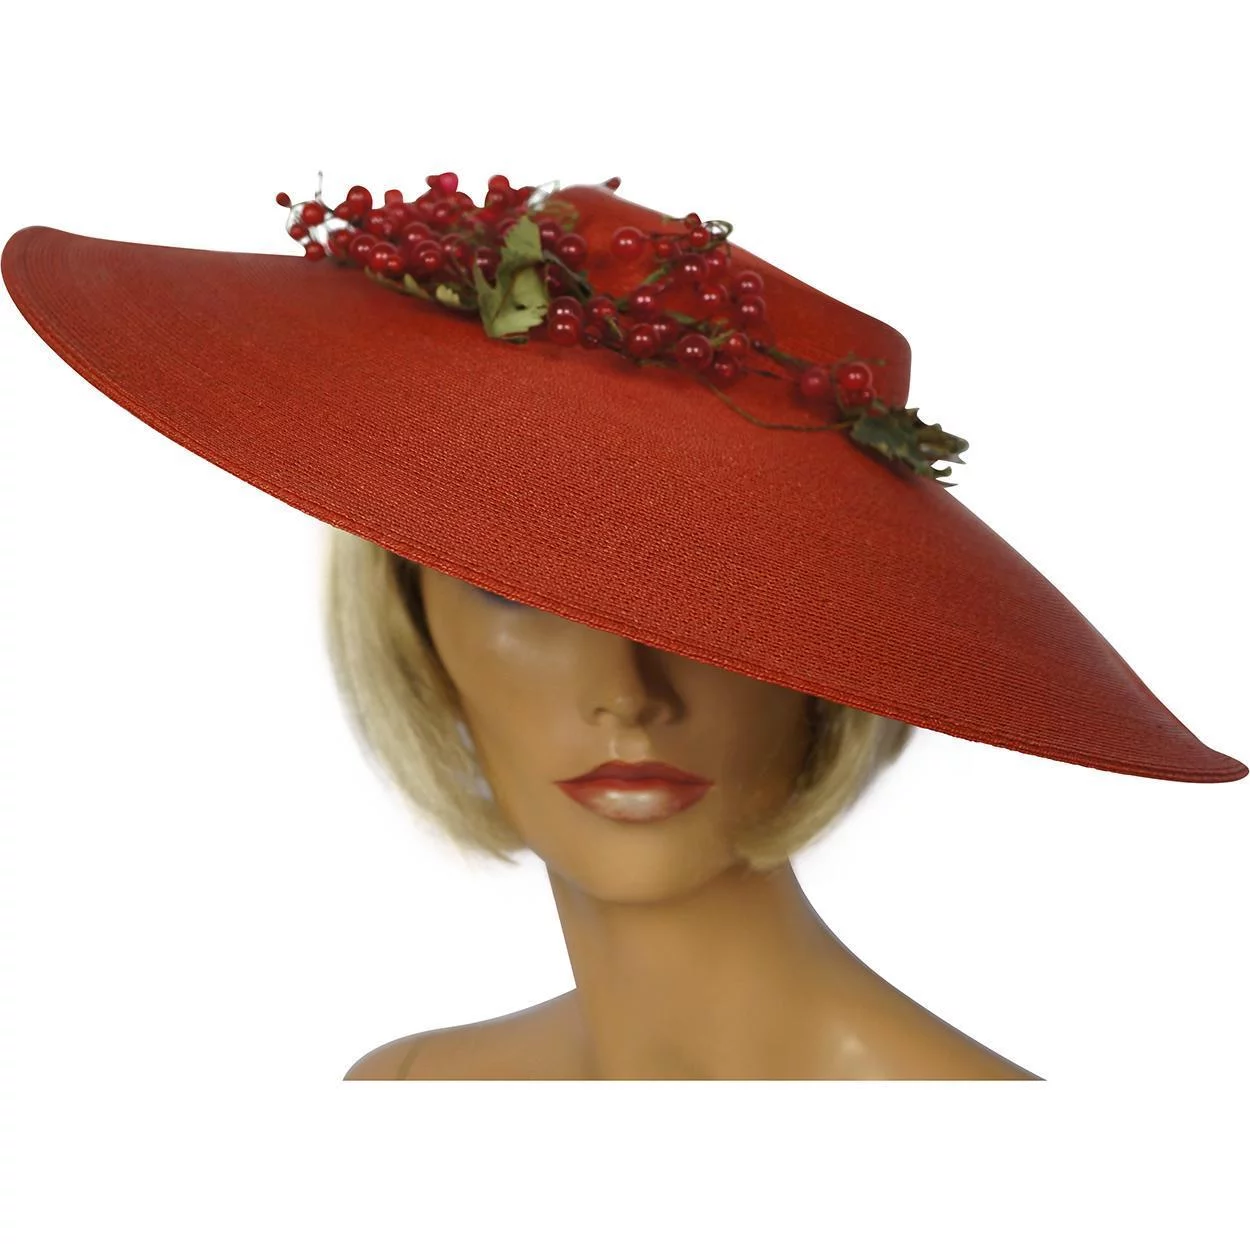 Vintage 1930s Garden Party Hat Red Straw Wide Brim Ladies Size M Found At Www Rubylane Com Vintagebeginshere Vintage Red Ga Hats Hats Vintage Pretty Hats